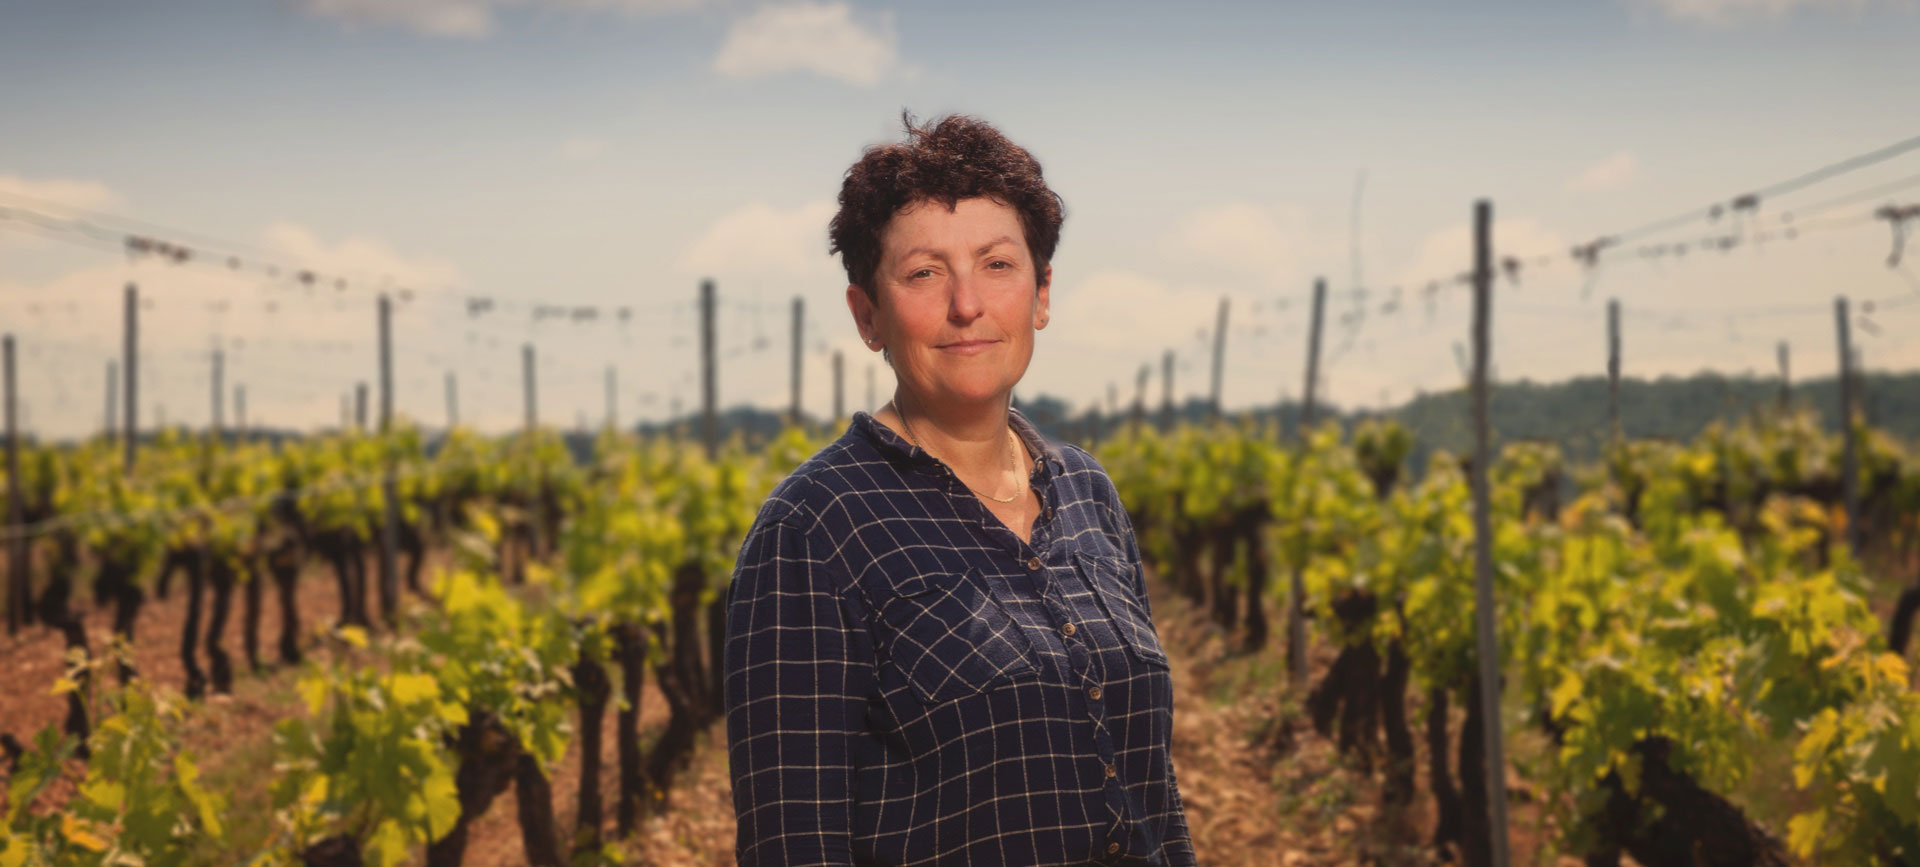 Rencontre avec Fabienne Rigal, viticultrice groupe Terres du Sud